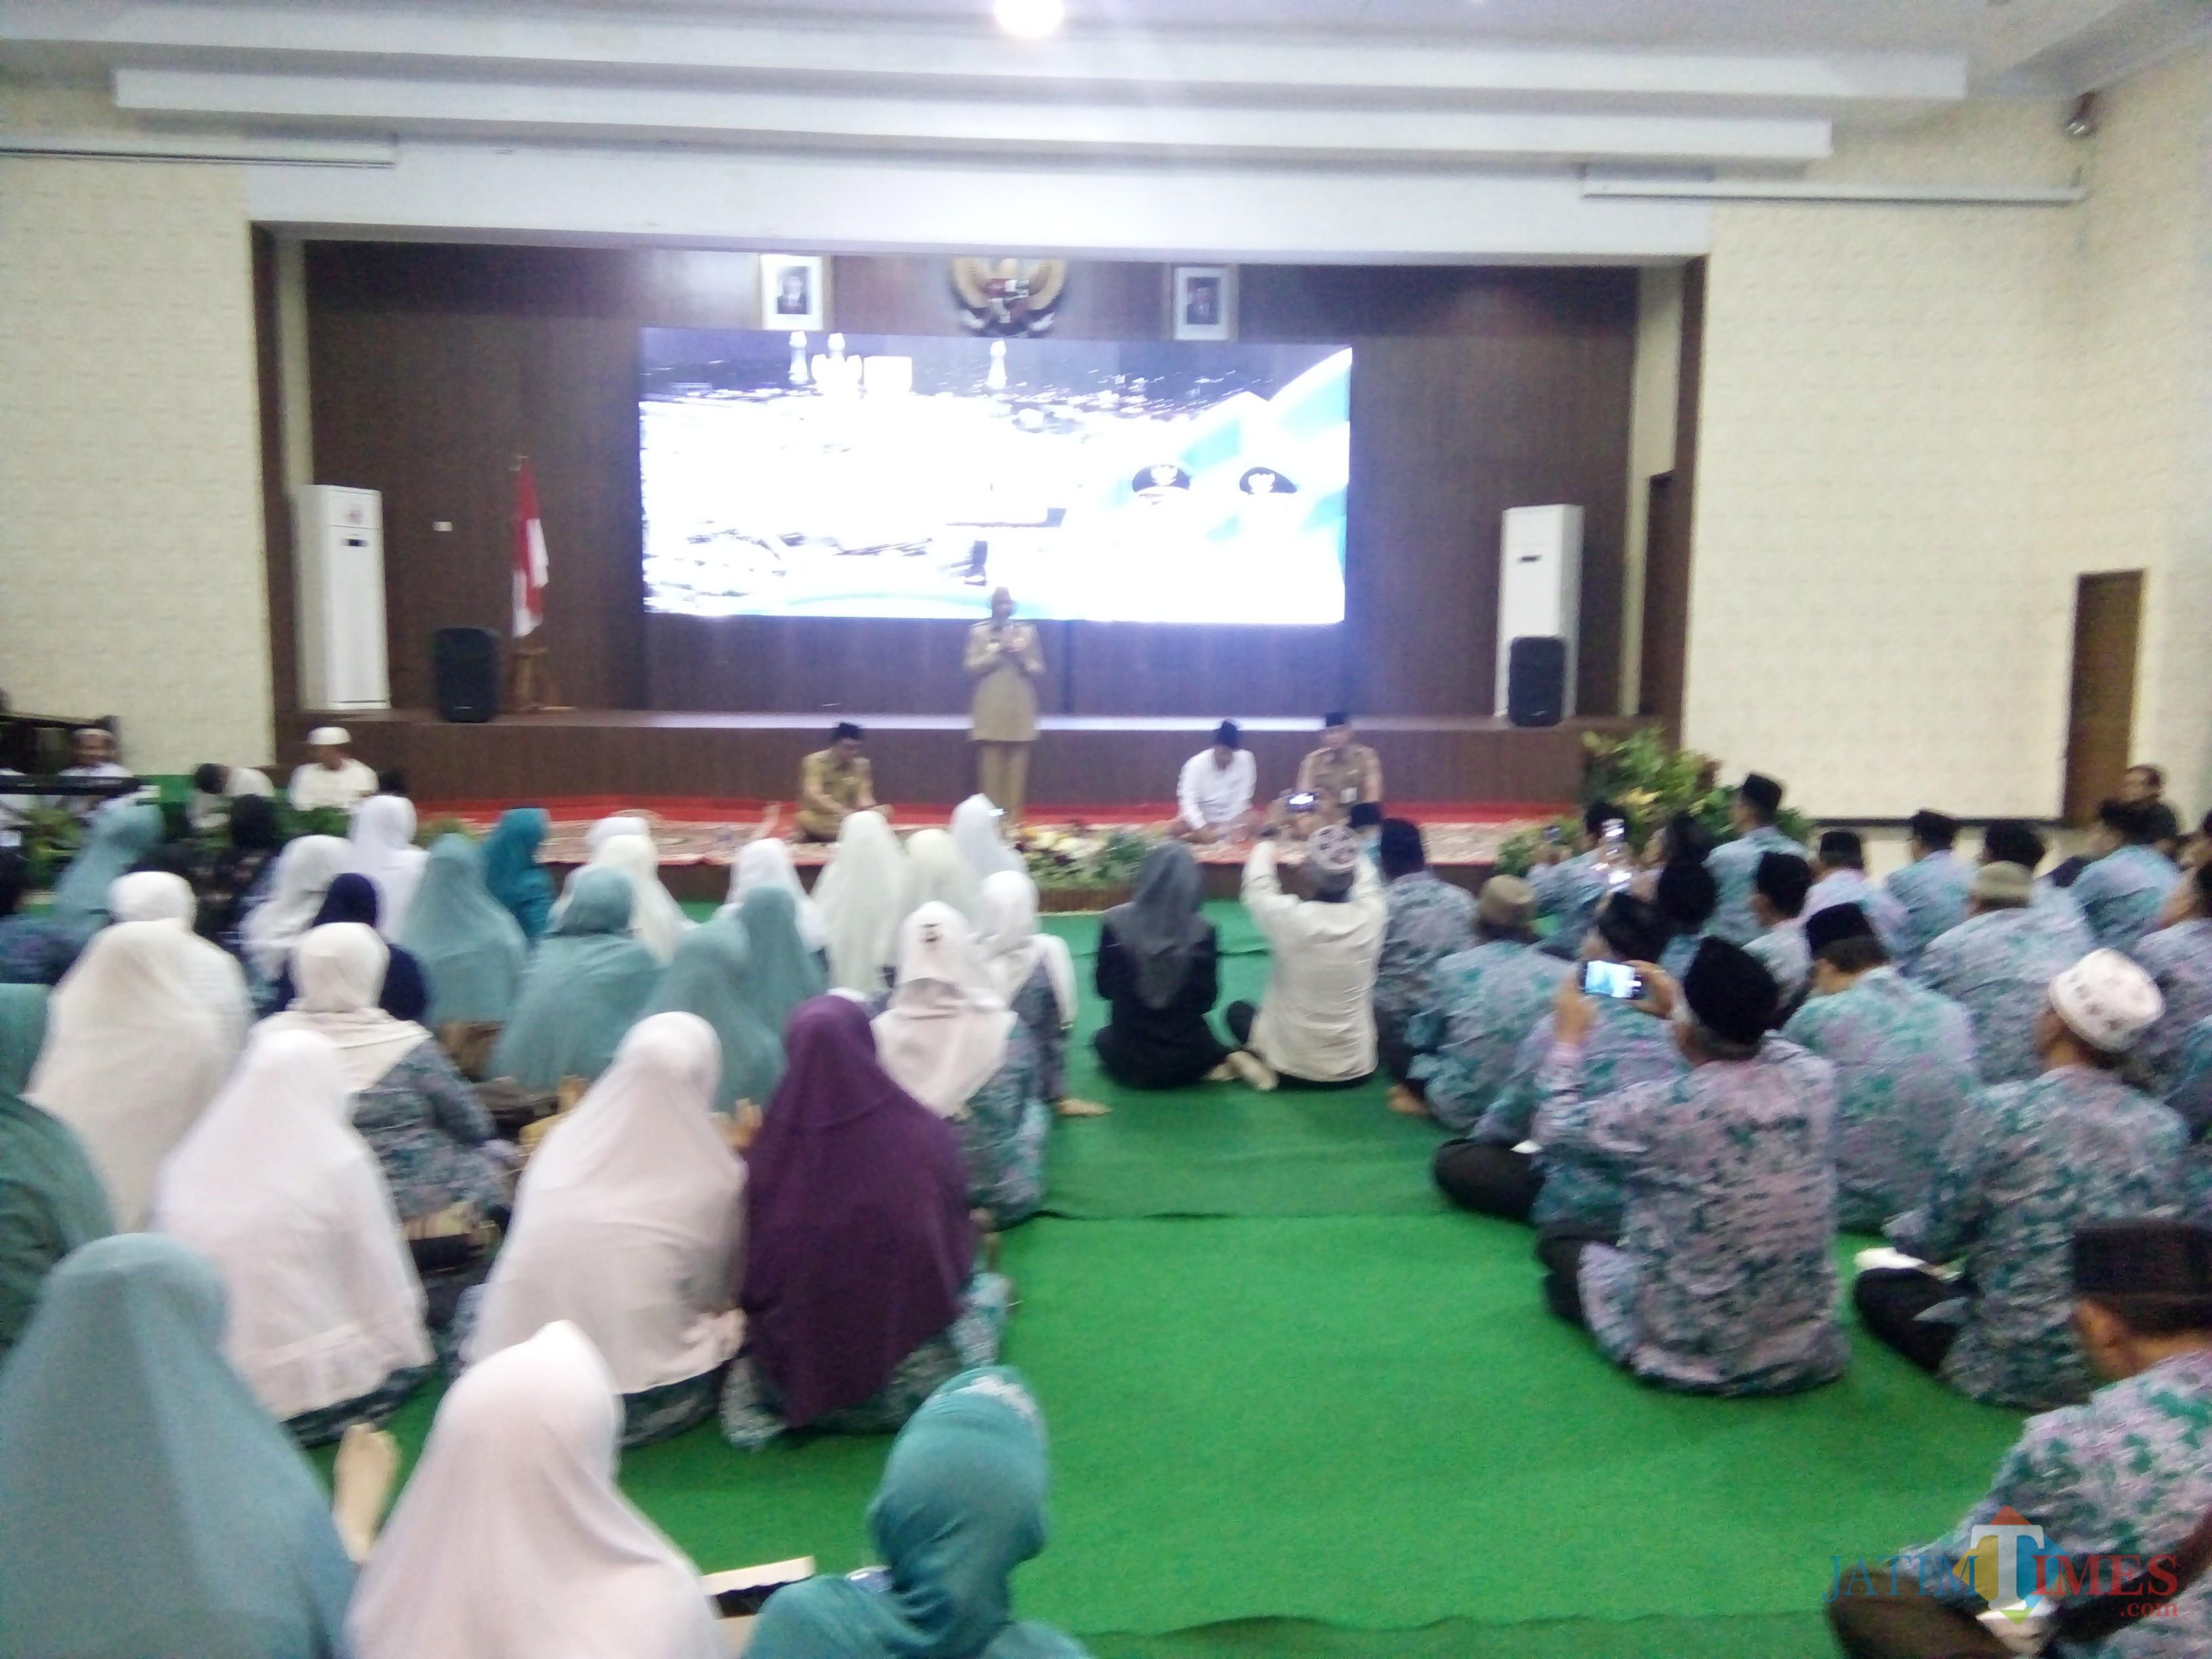 Bupati Jember saat memberikan sambutan kepada ASN yang akan berangkat menunaikan ibadah haji. (foto : Moh. Ali Makrus / jatim TIMES)